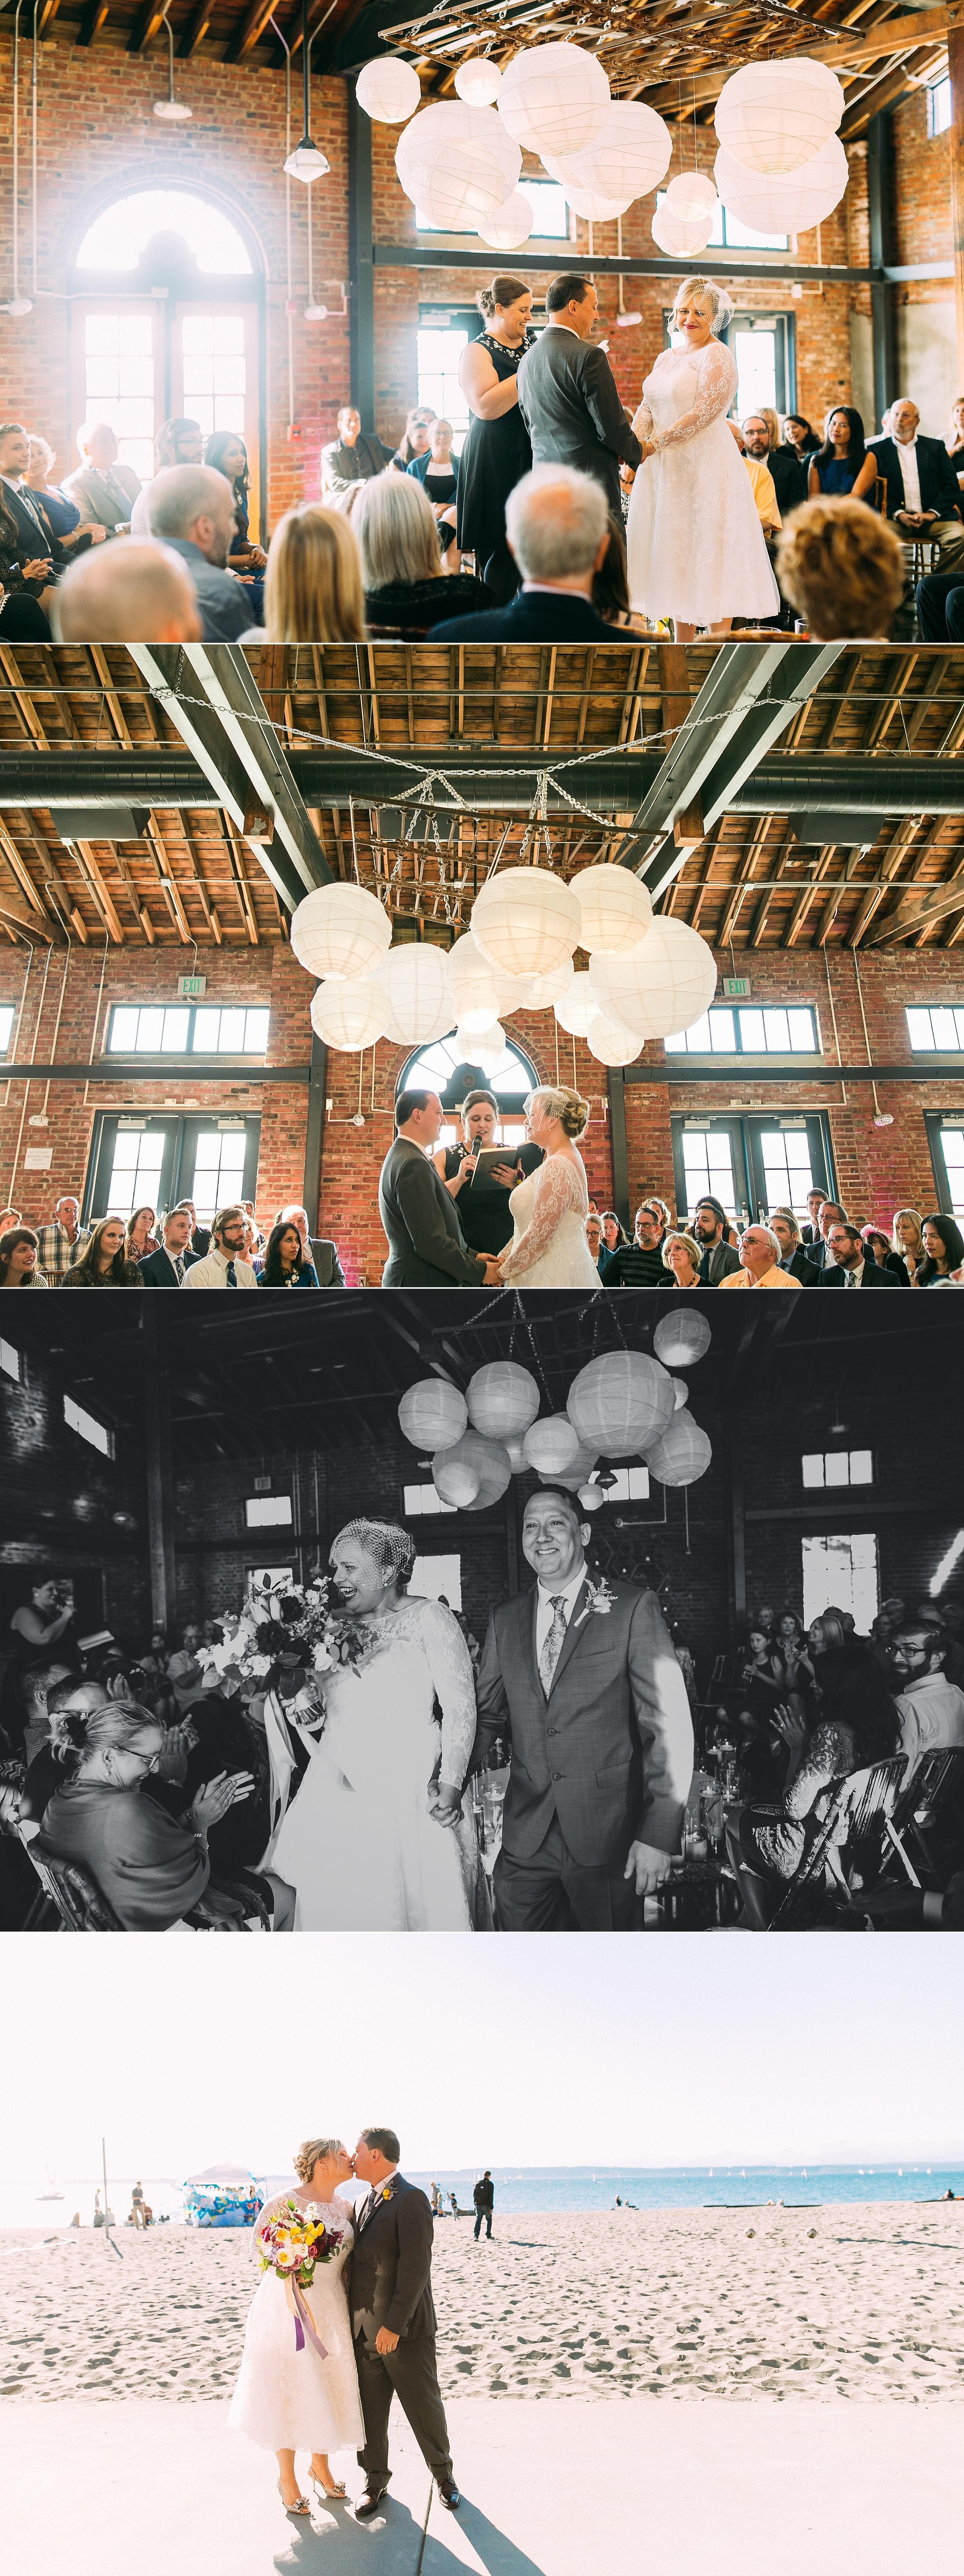 ashley vos photography seattle area wedding photographer_0832.jpg